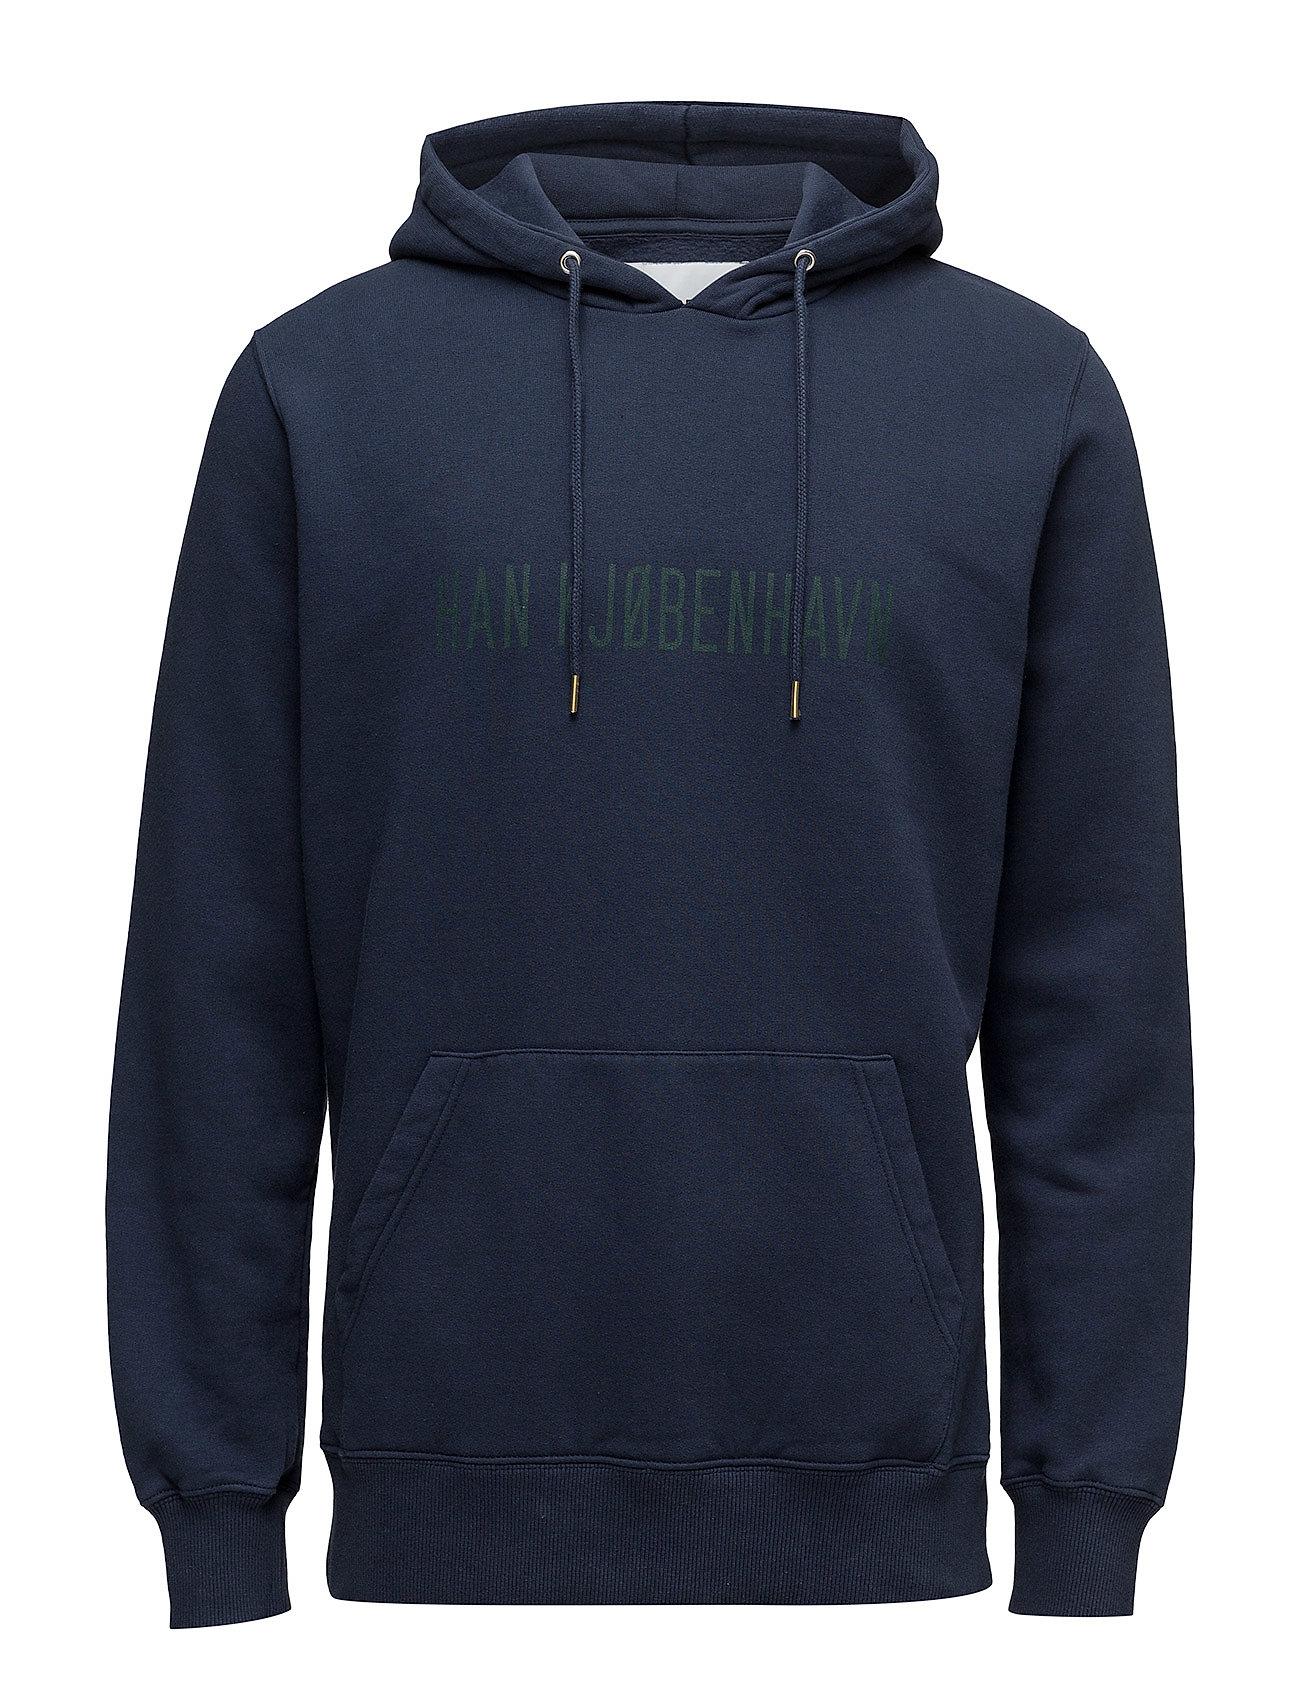 han kjã¸benhavn Casual hoodie på boozt.com dk